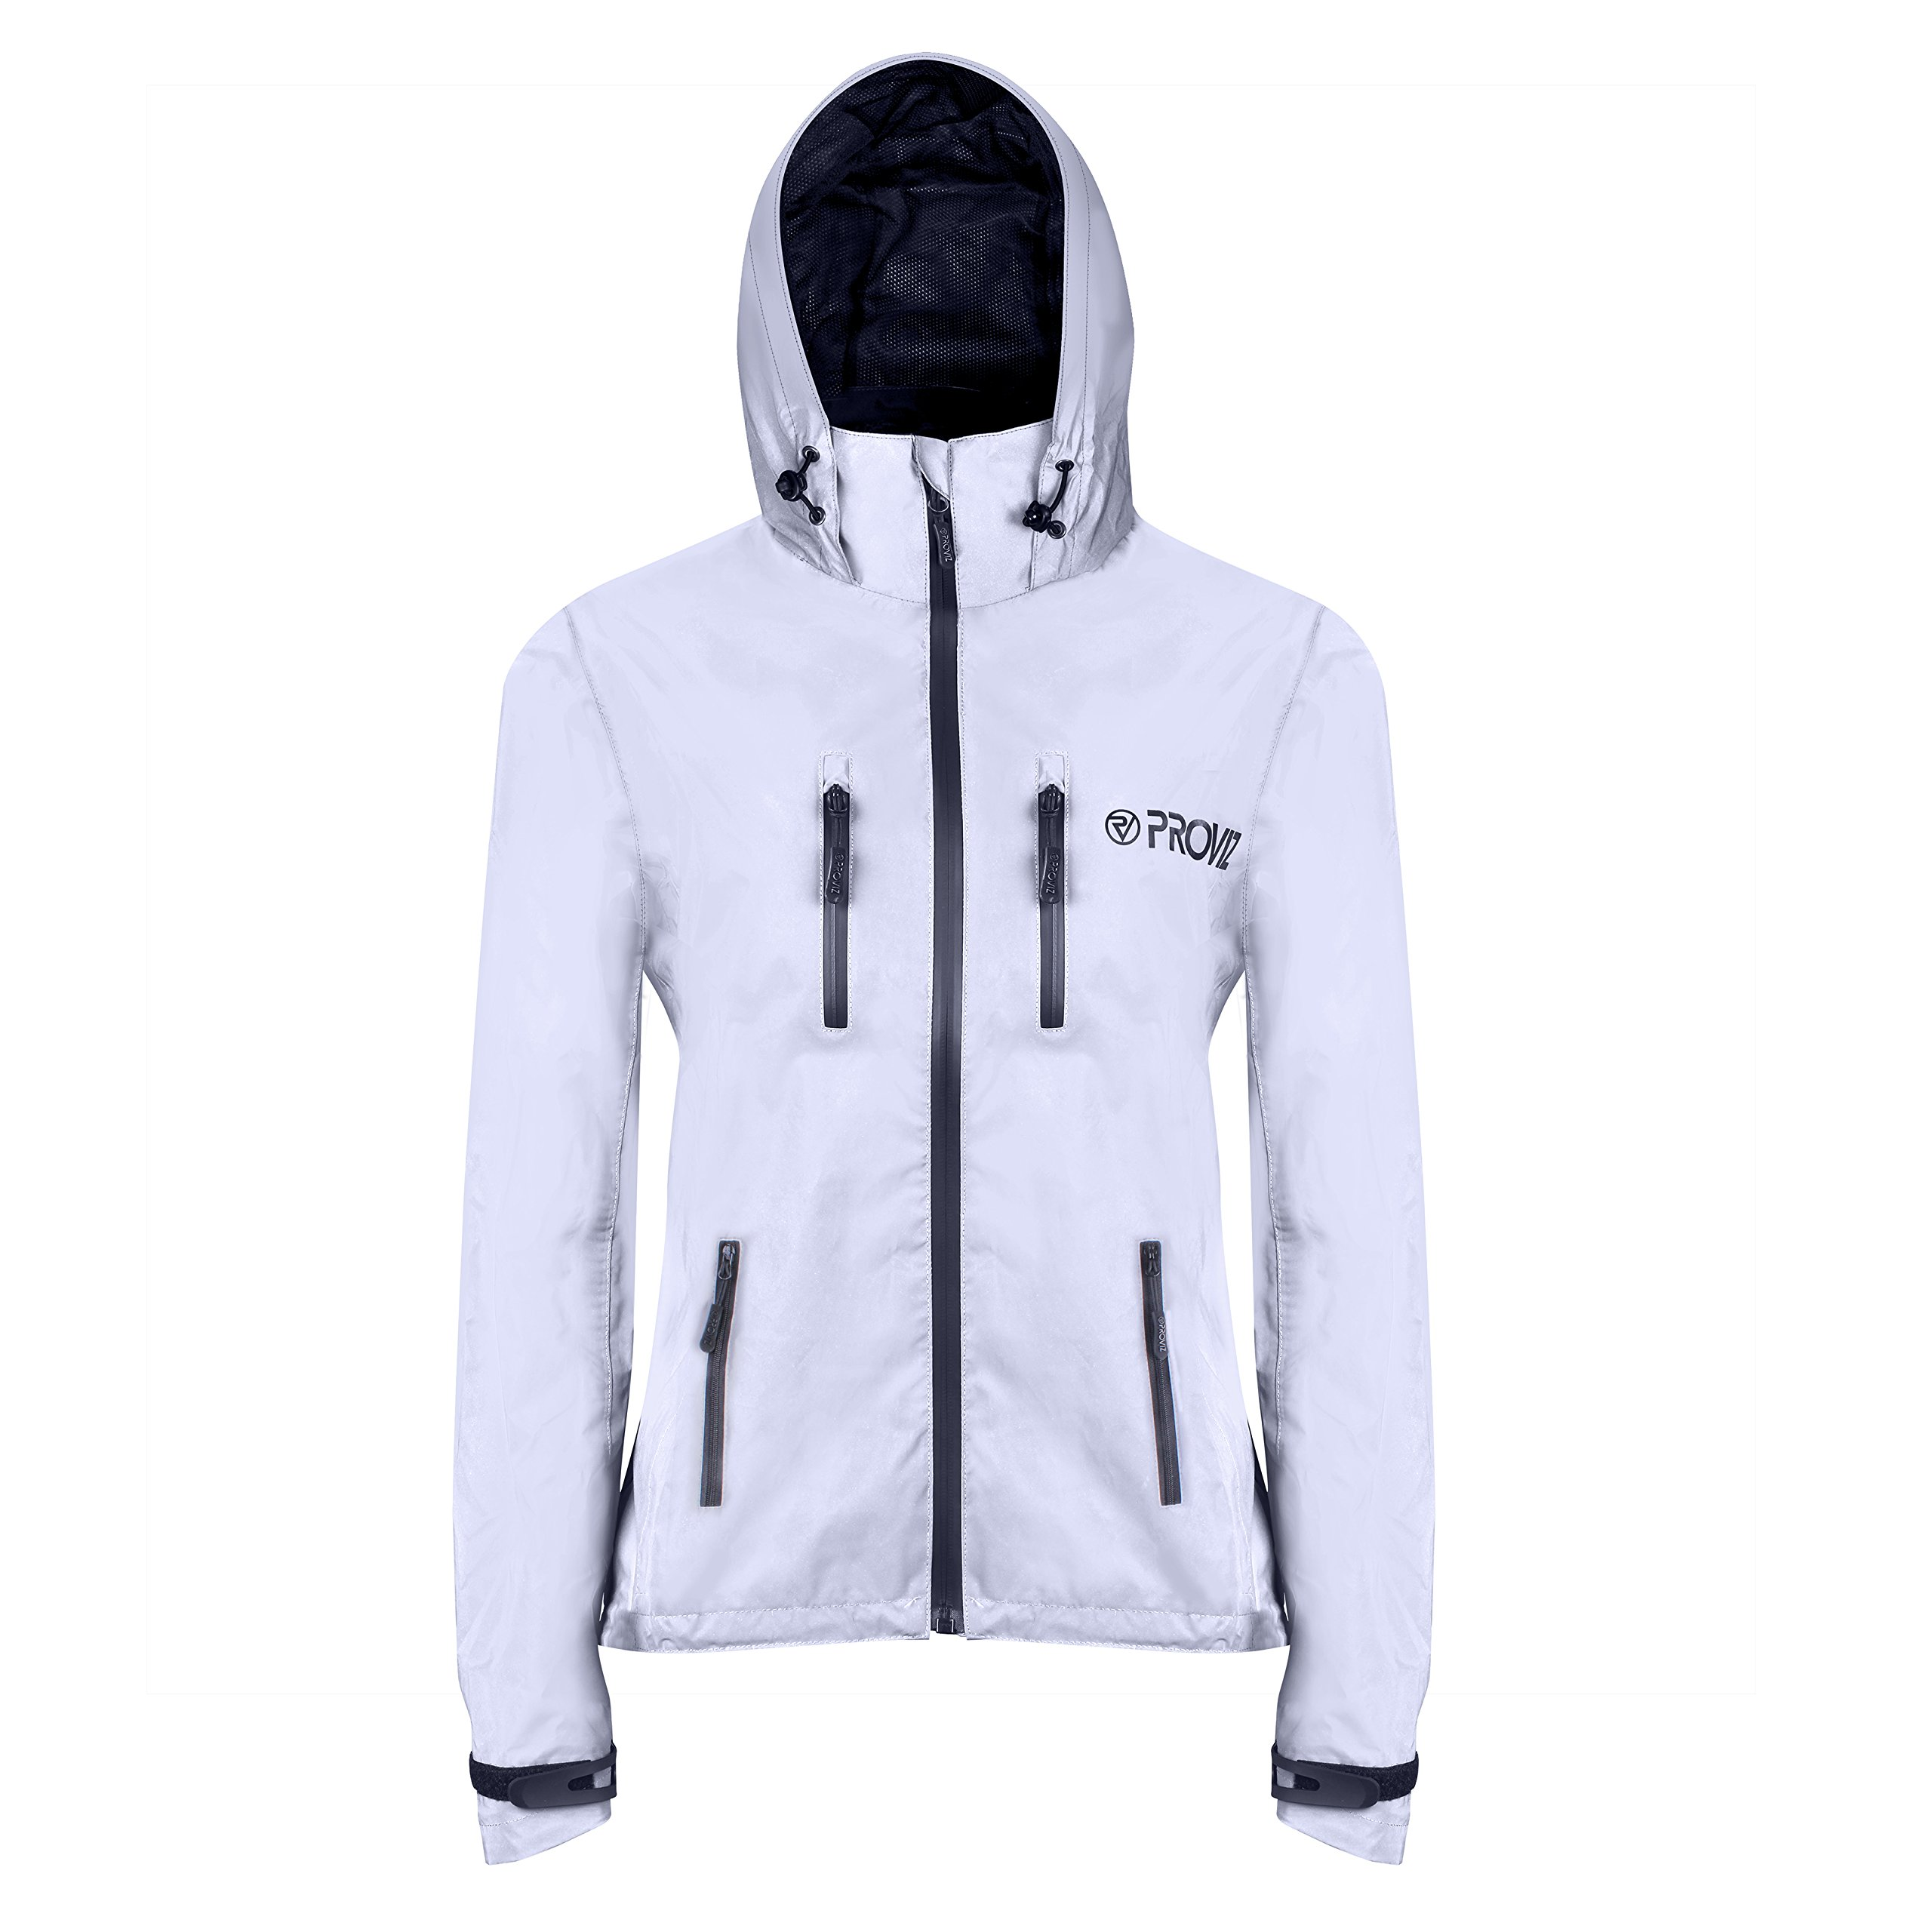 Proviz Women's REFLECT360 Outdoor Jacket, 12, Silver